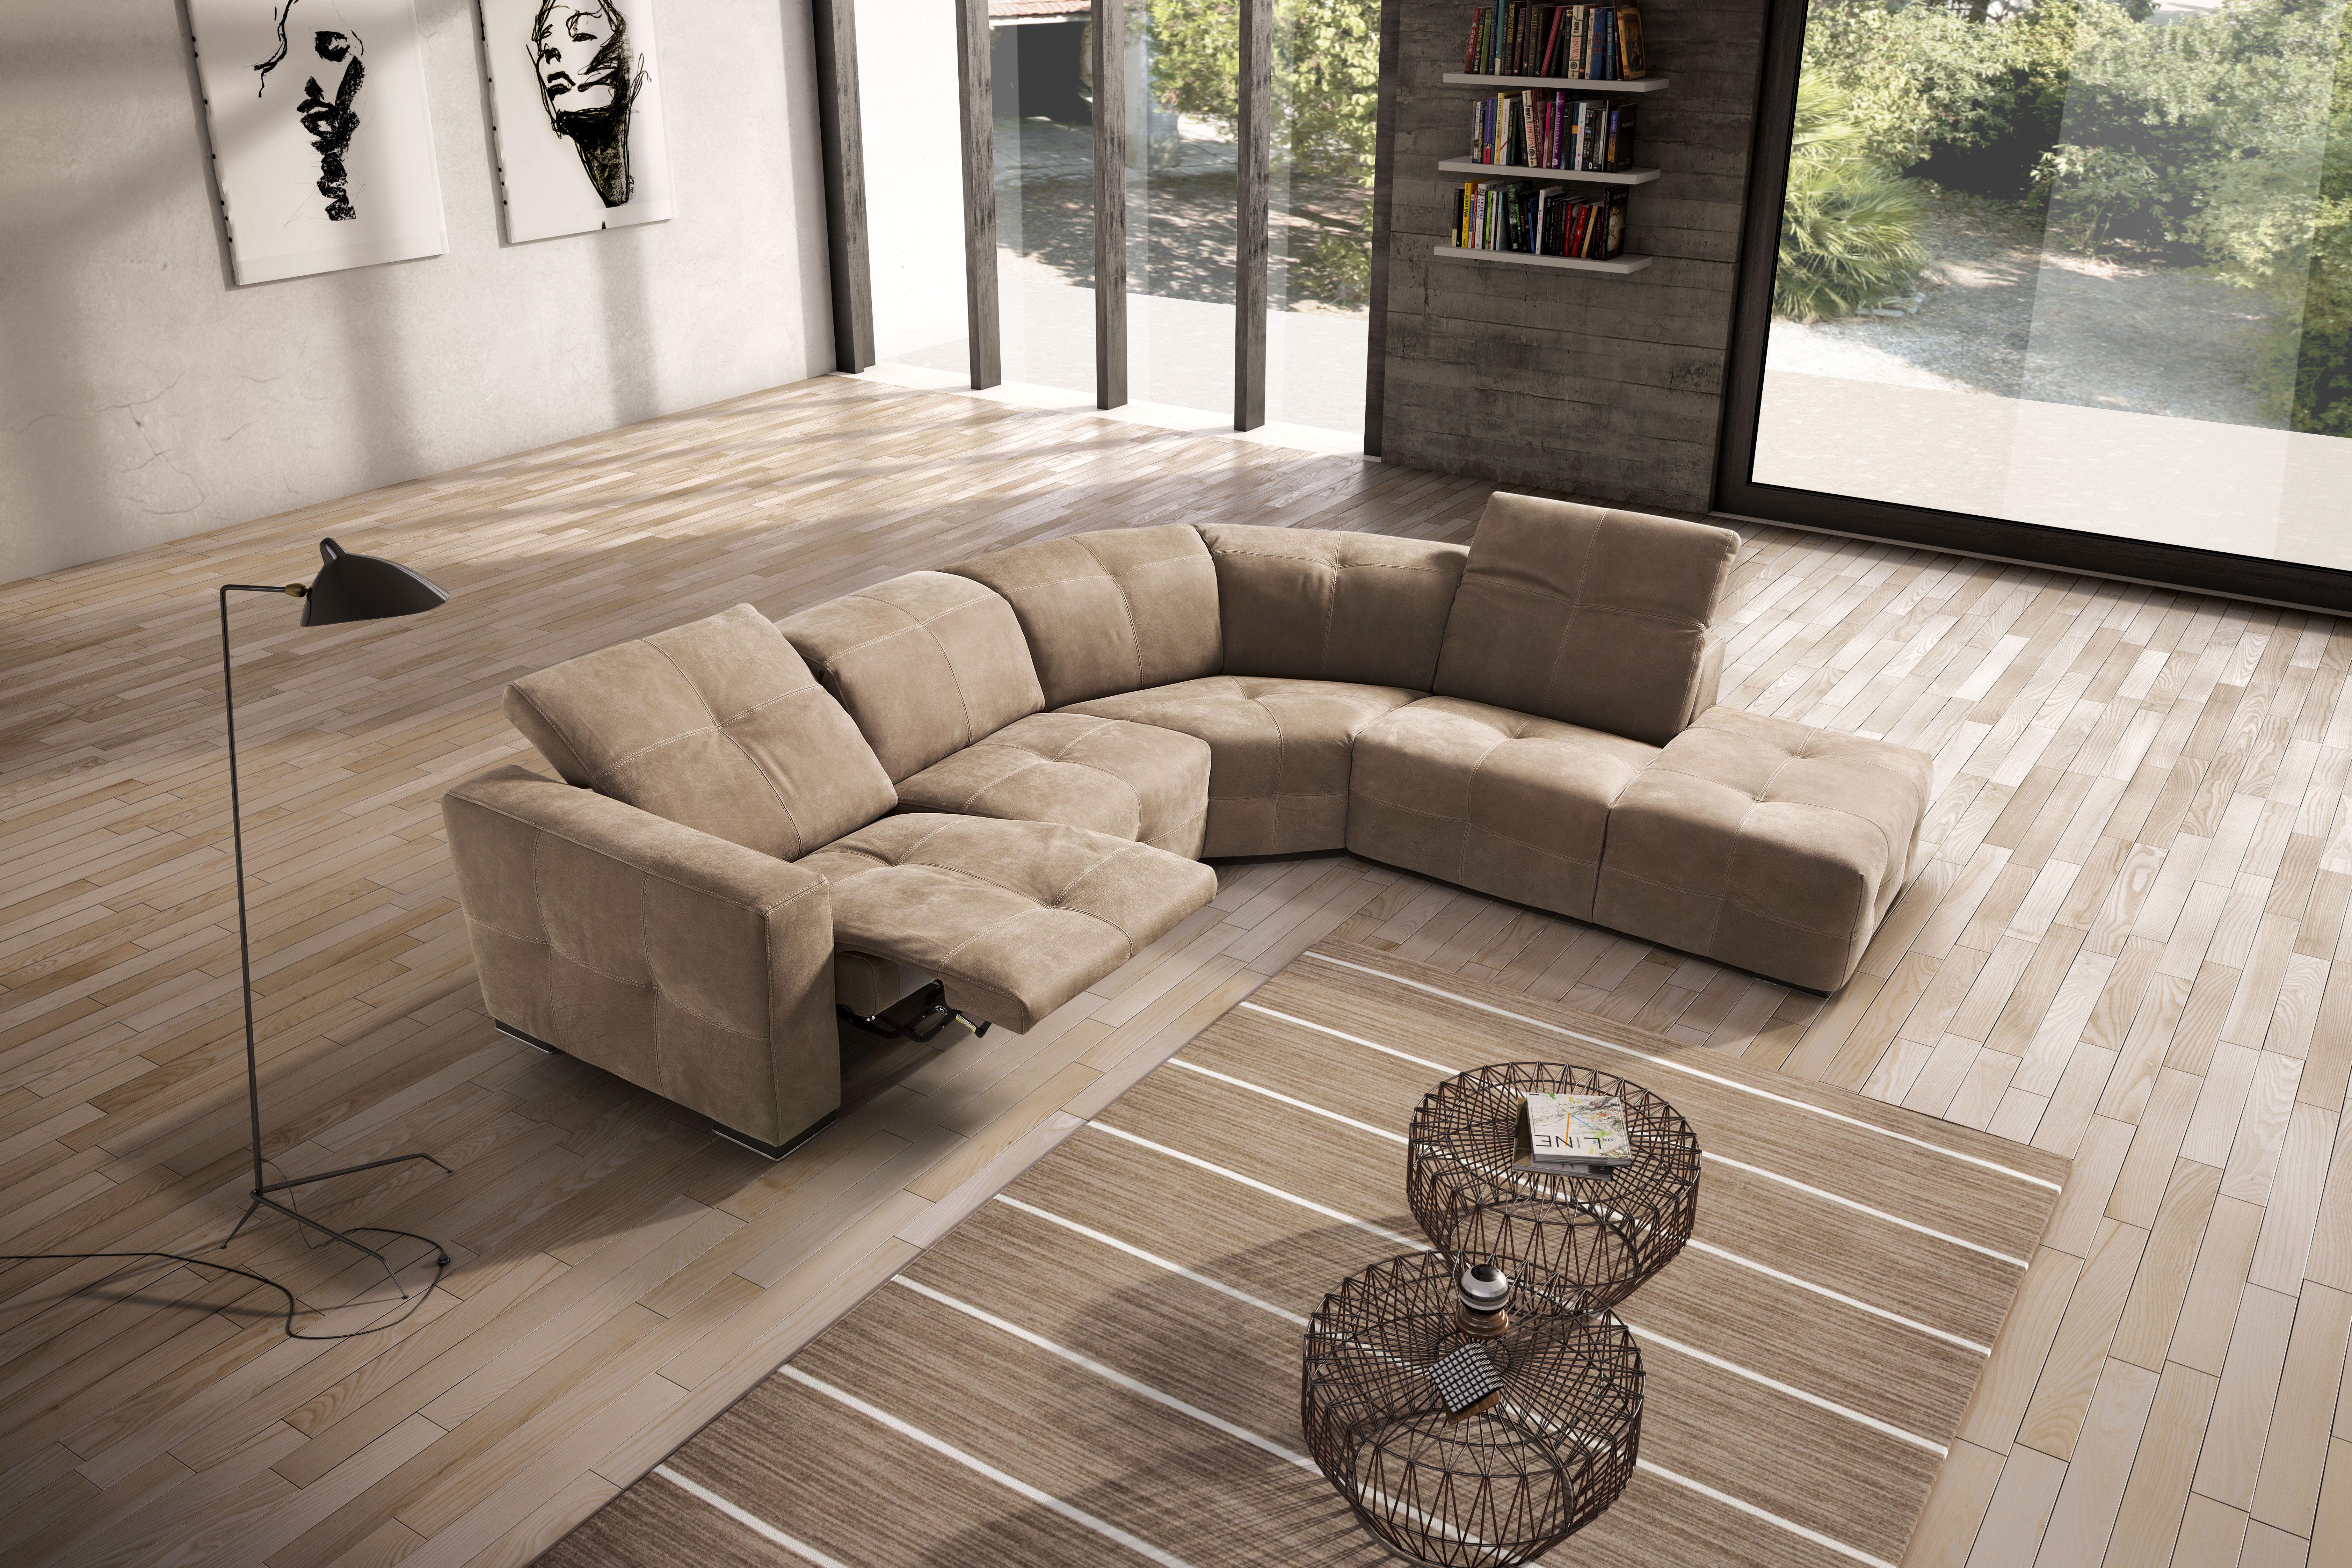 Ecointeriors Ecoexclusive Egoitaliano Couch Italian